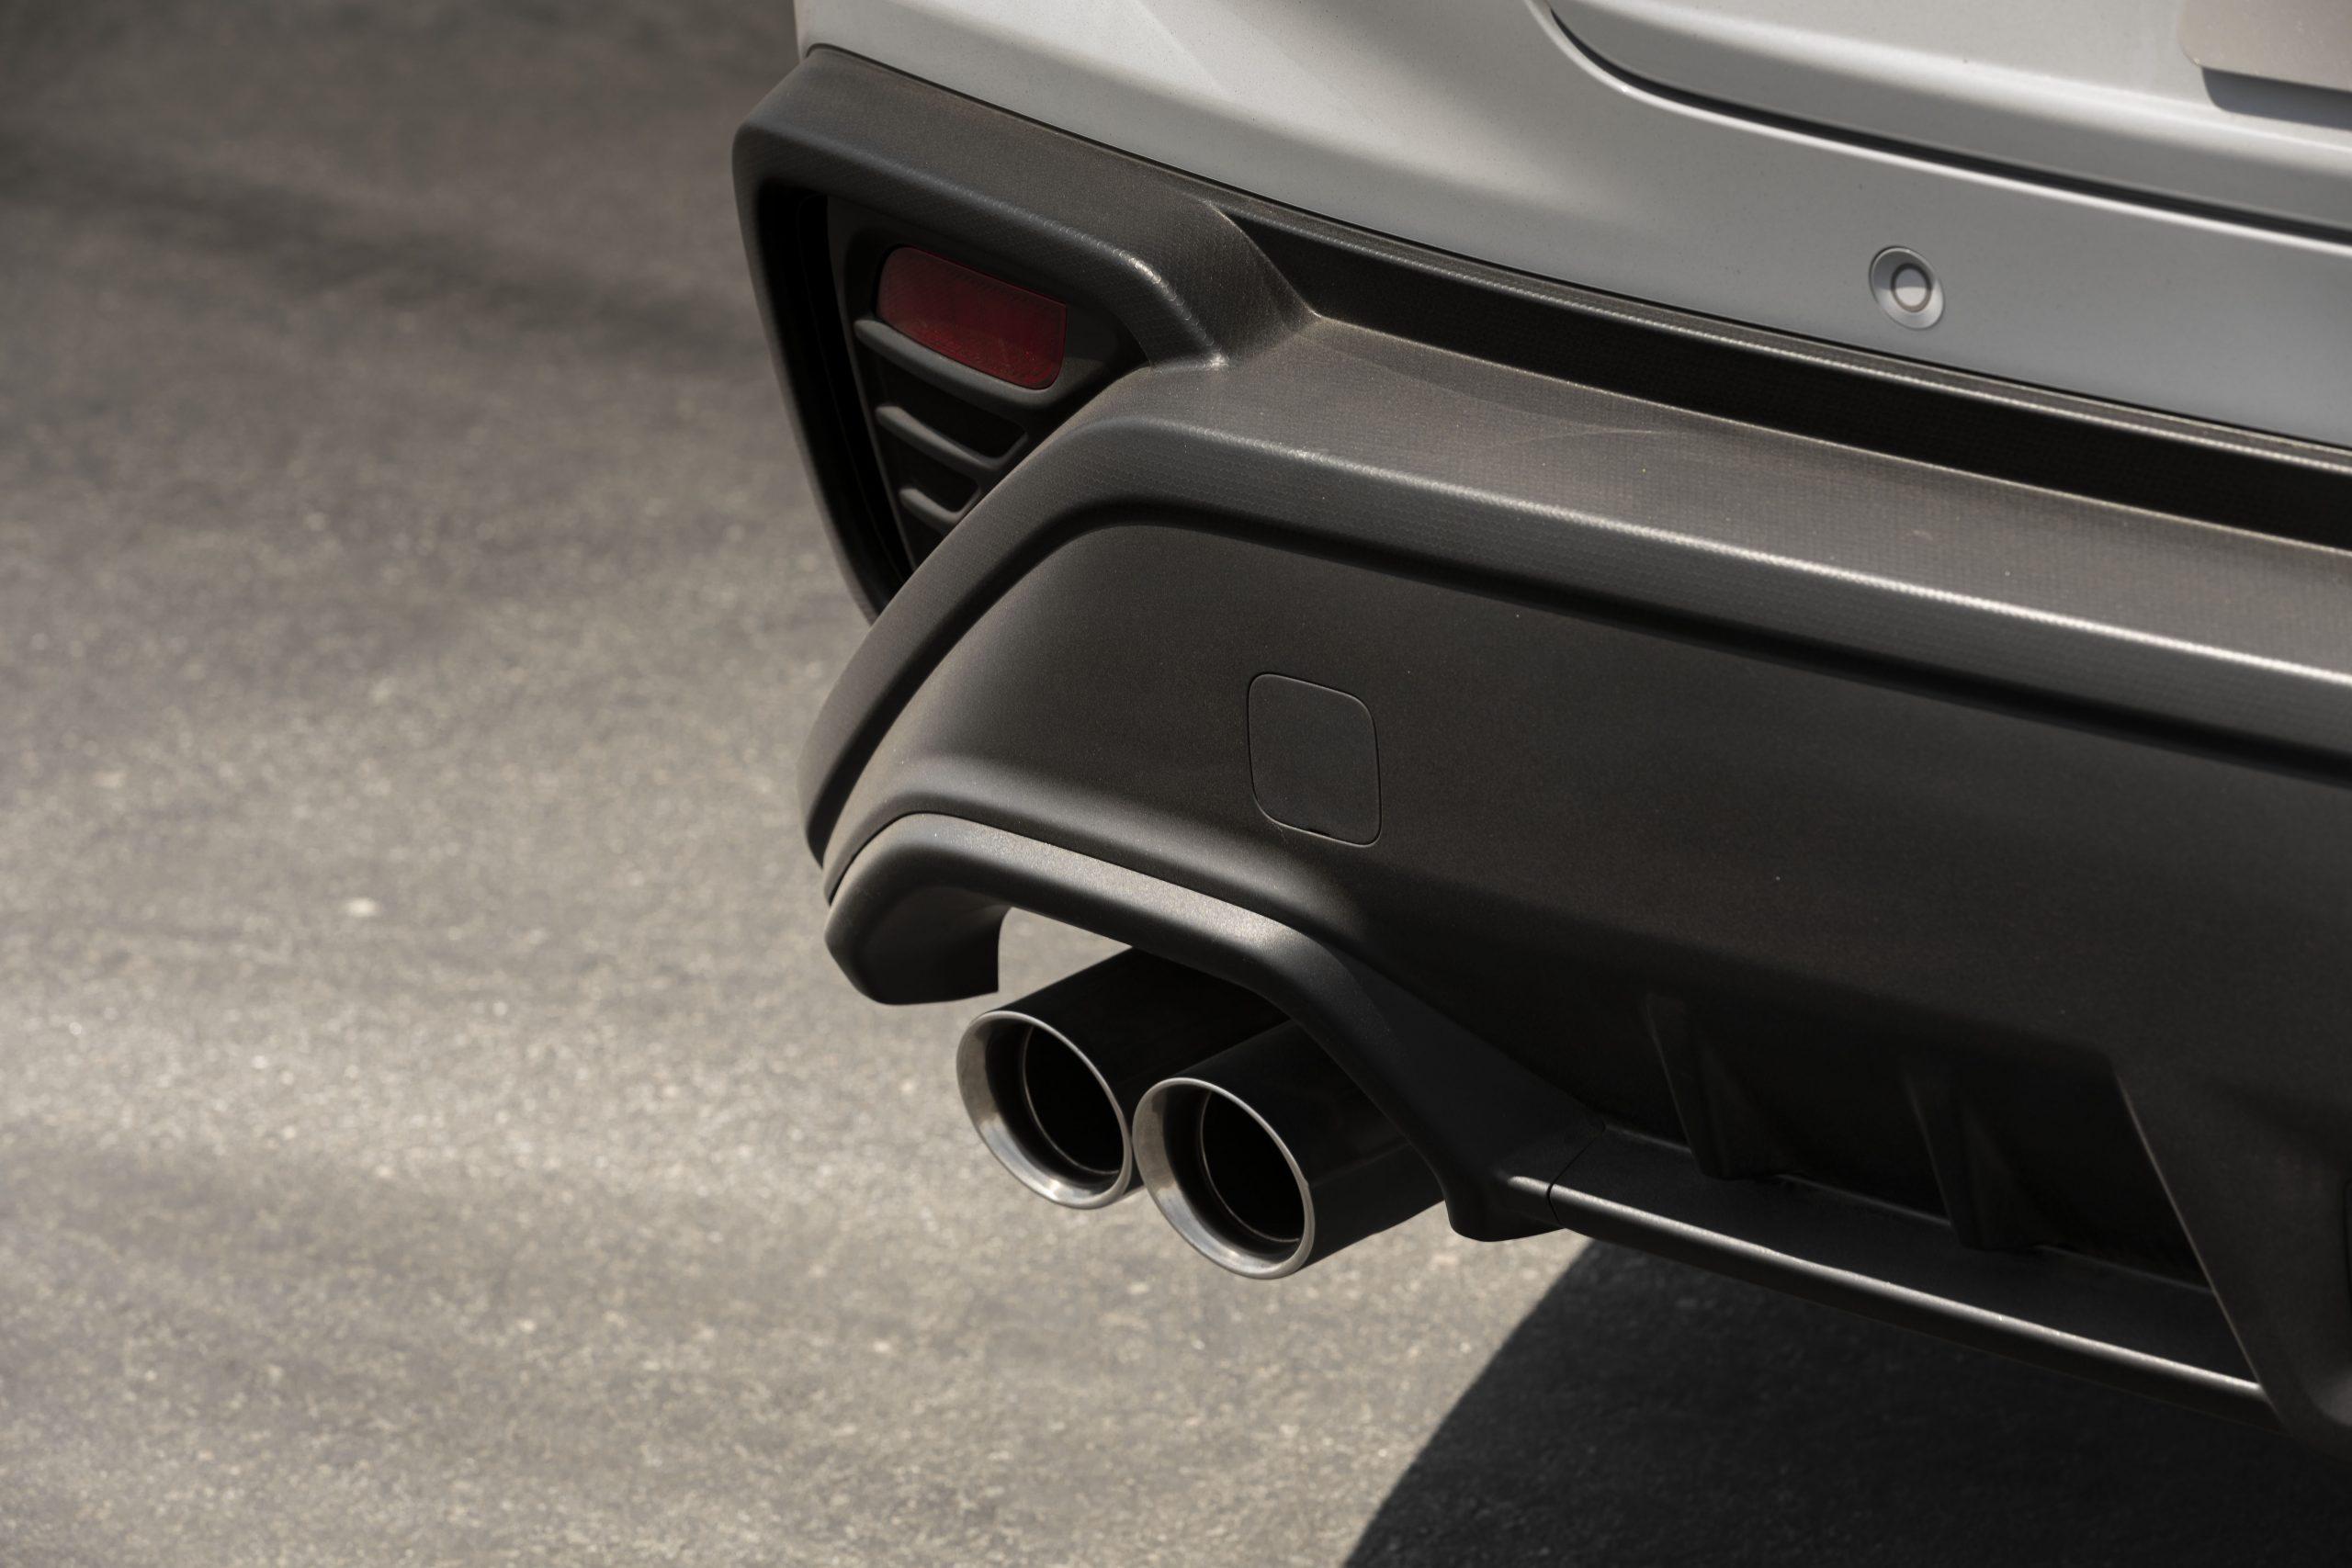 2022 Subaru WRX rear bumper exhaust tip detail